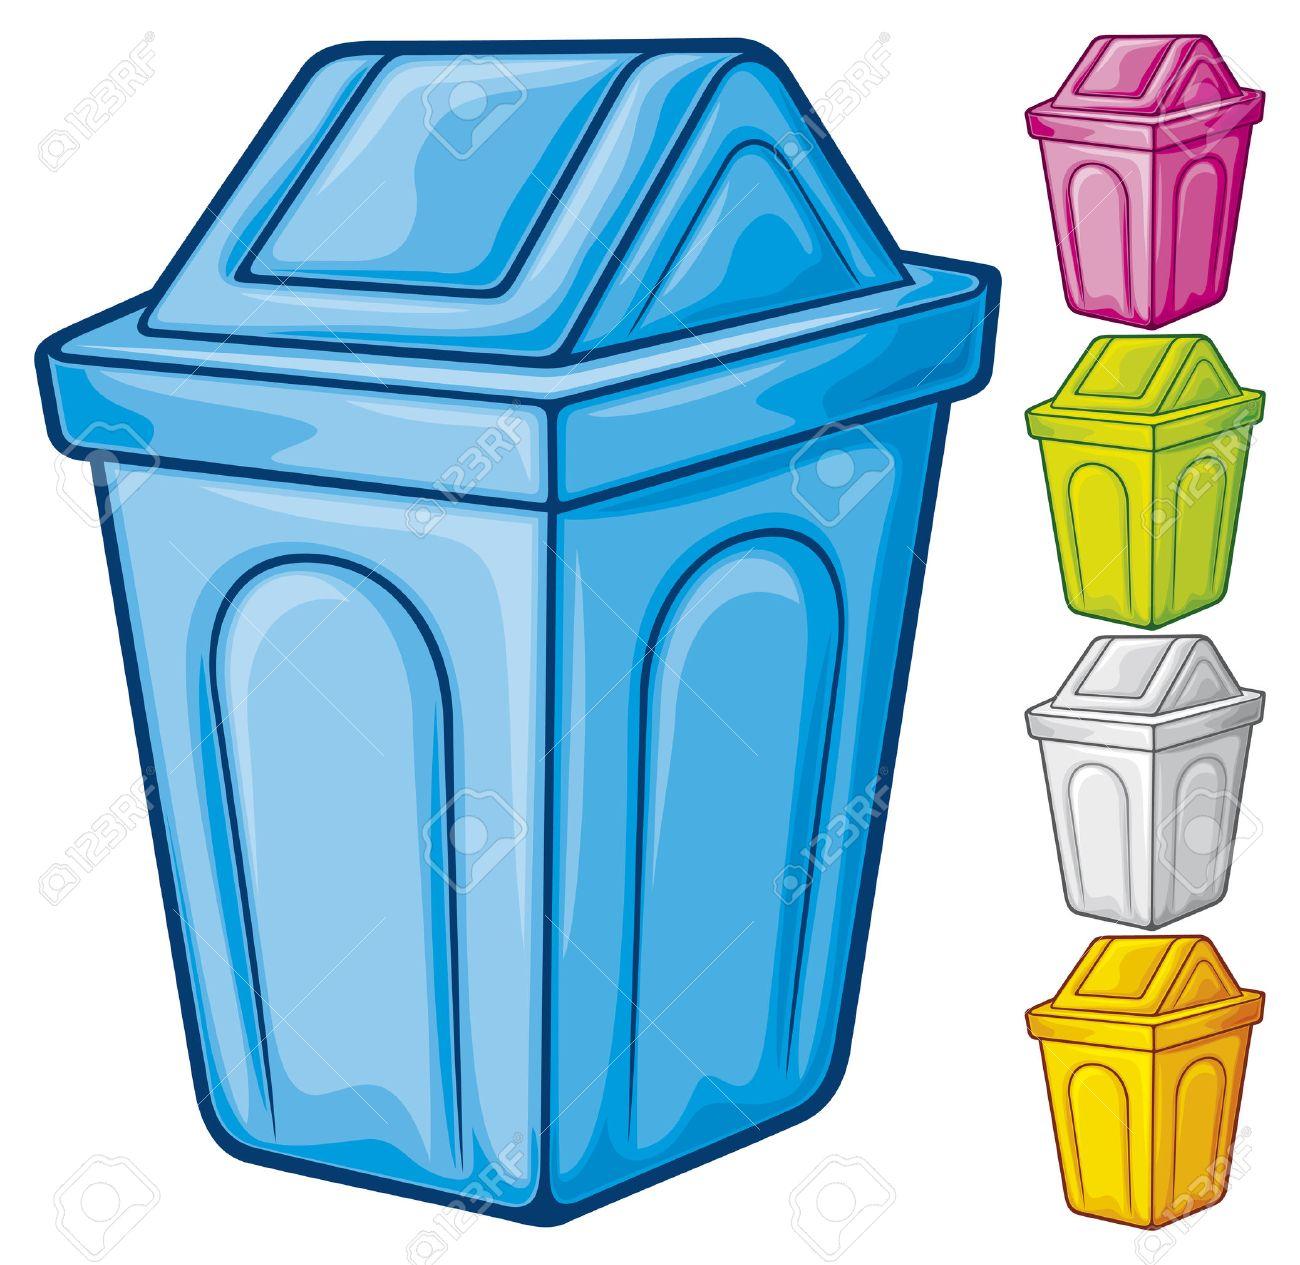 recycle bin waste recycle can, waste bin, recycle trash can, waste can, trash can - 23126174